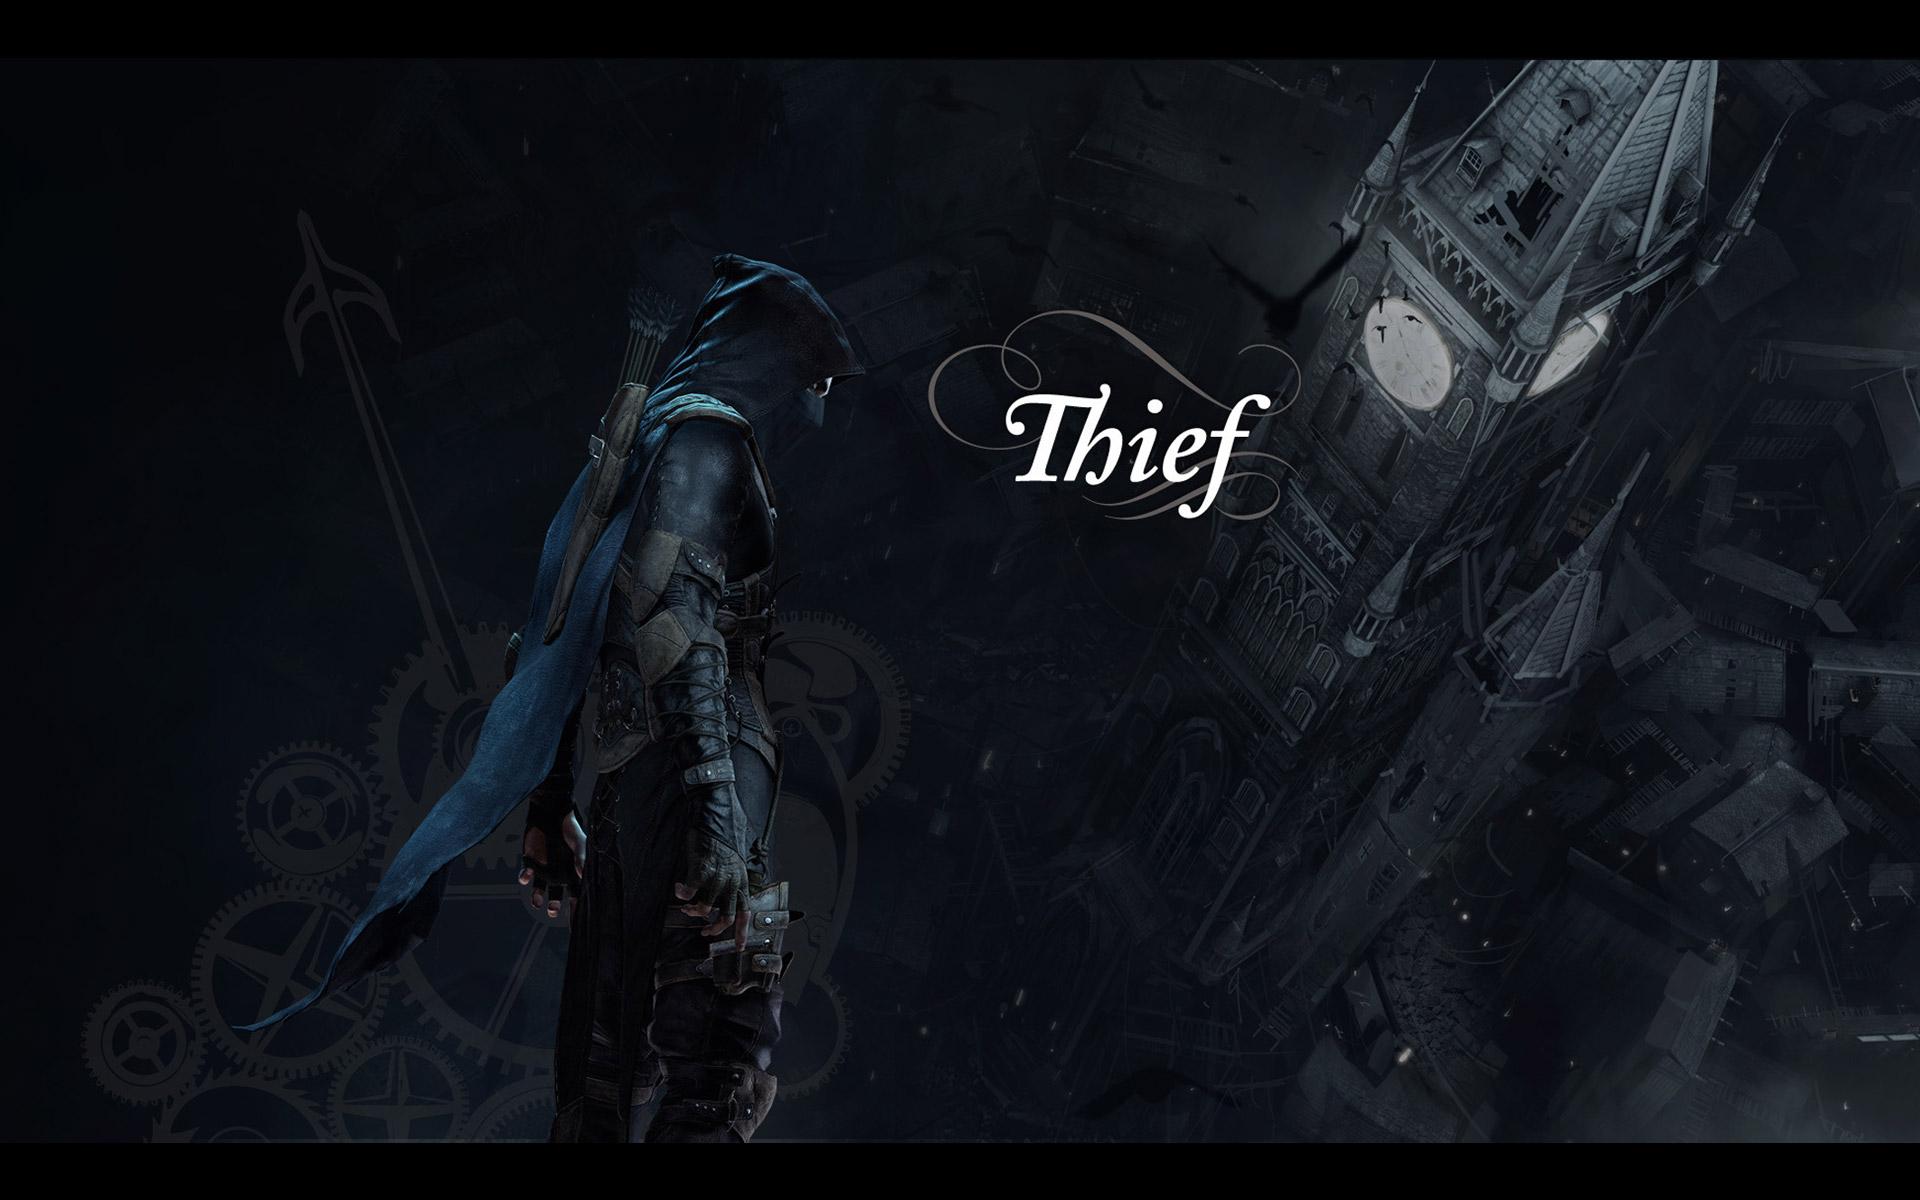 Thief wallpaper 4